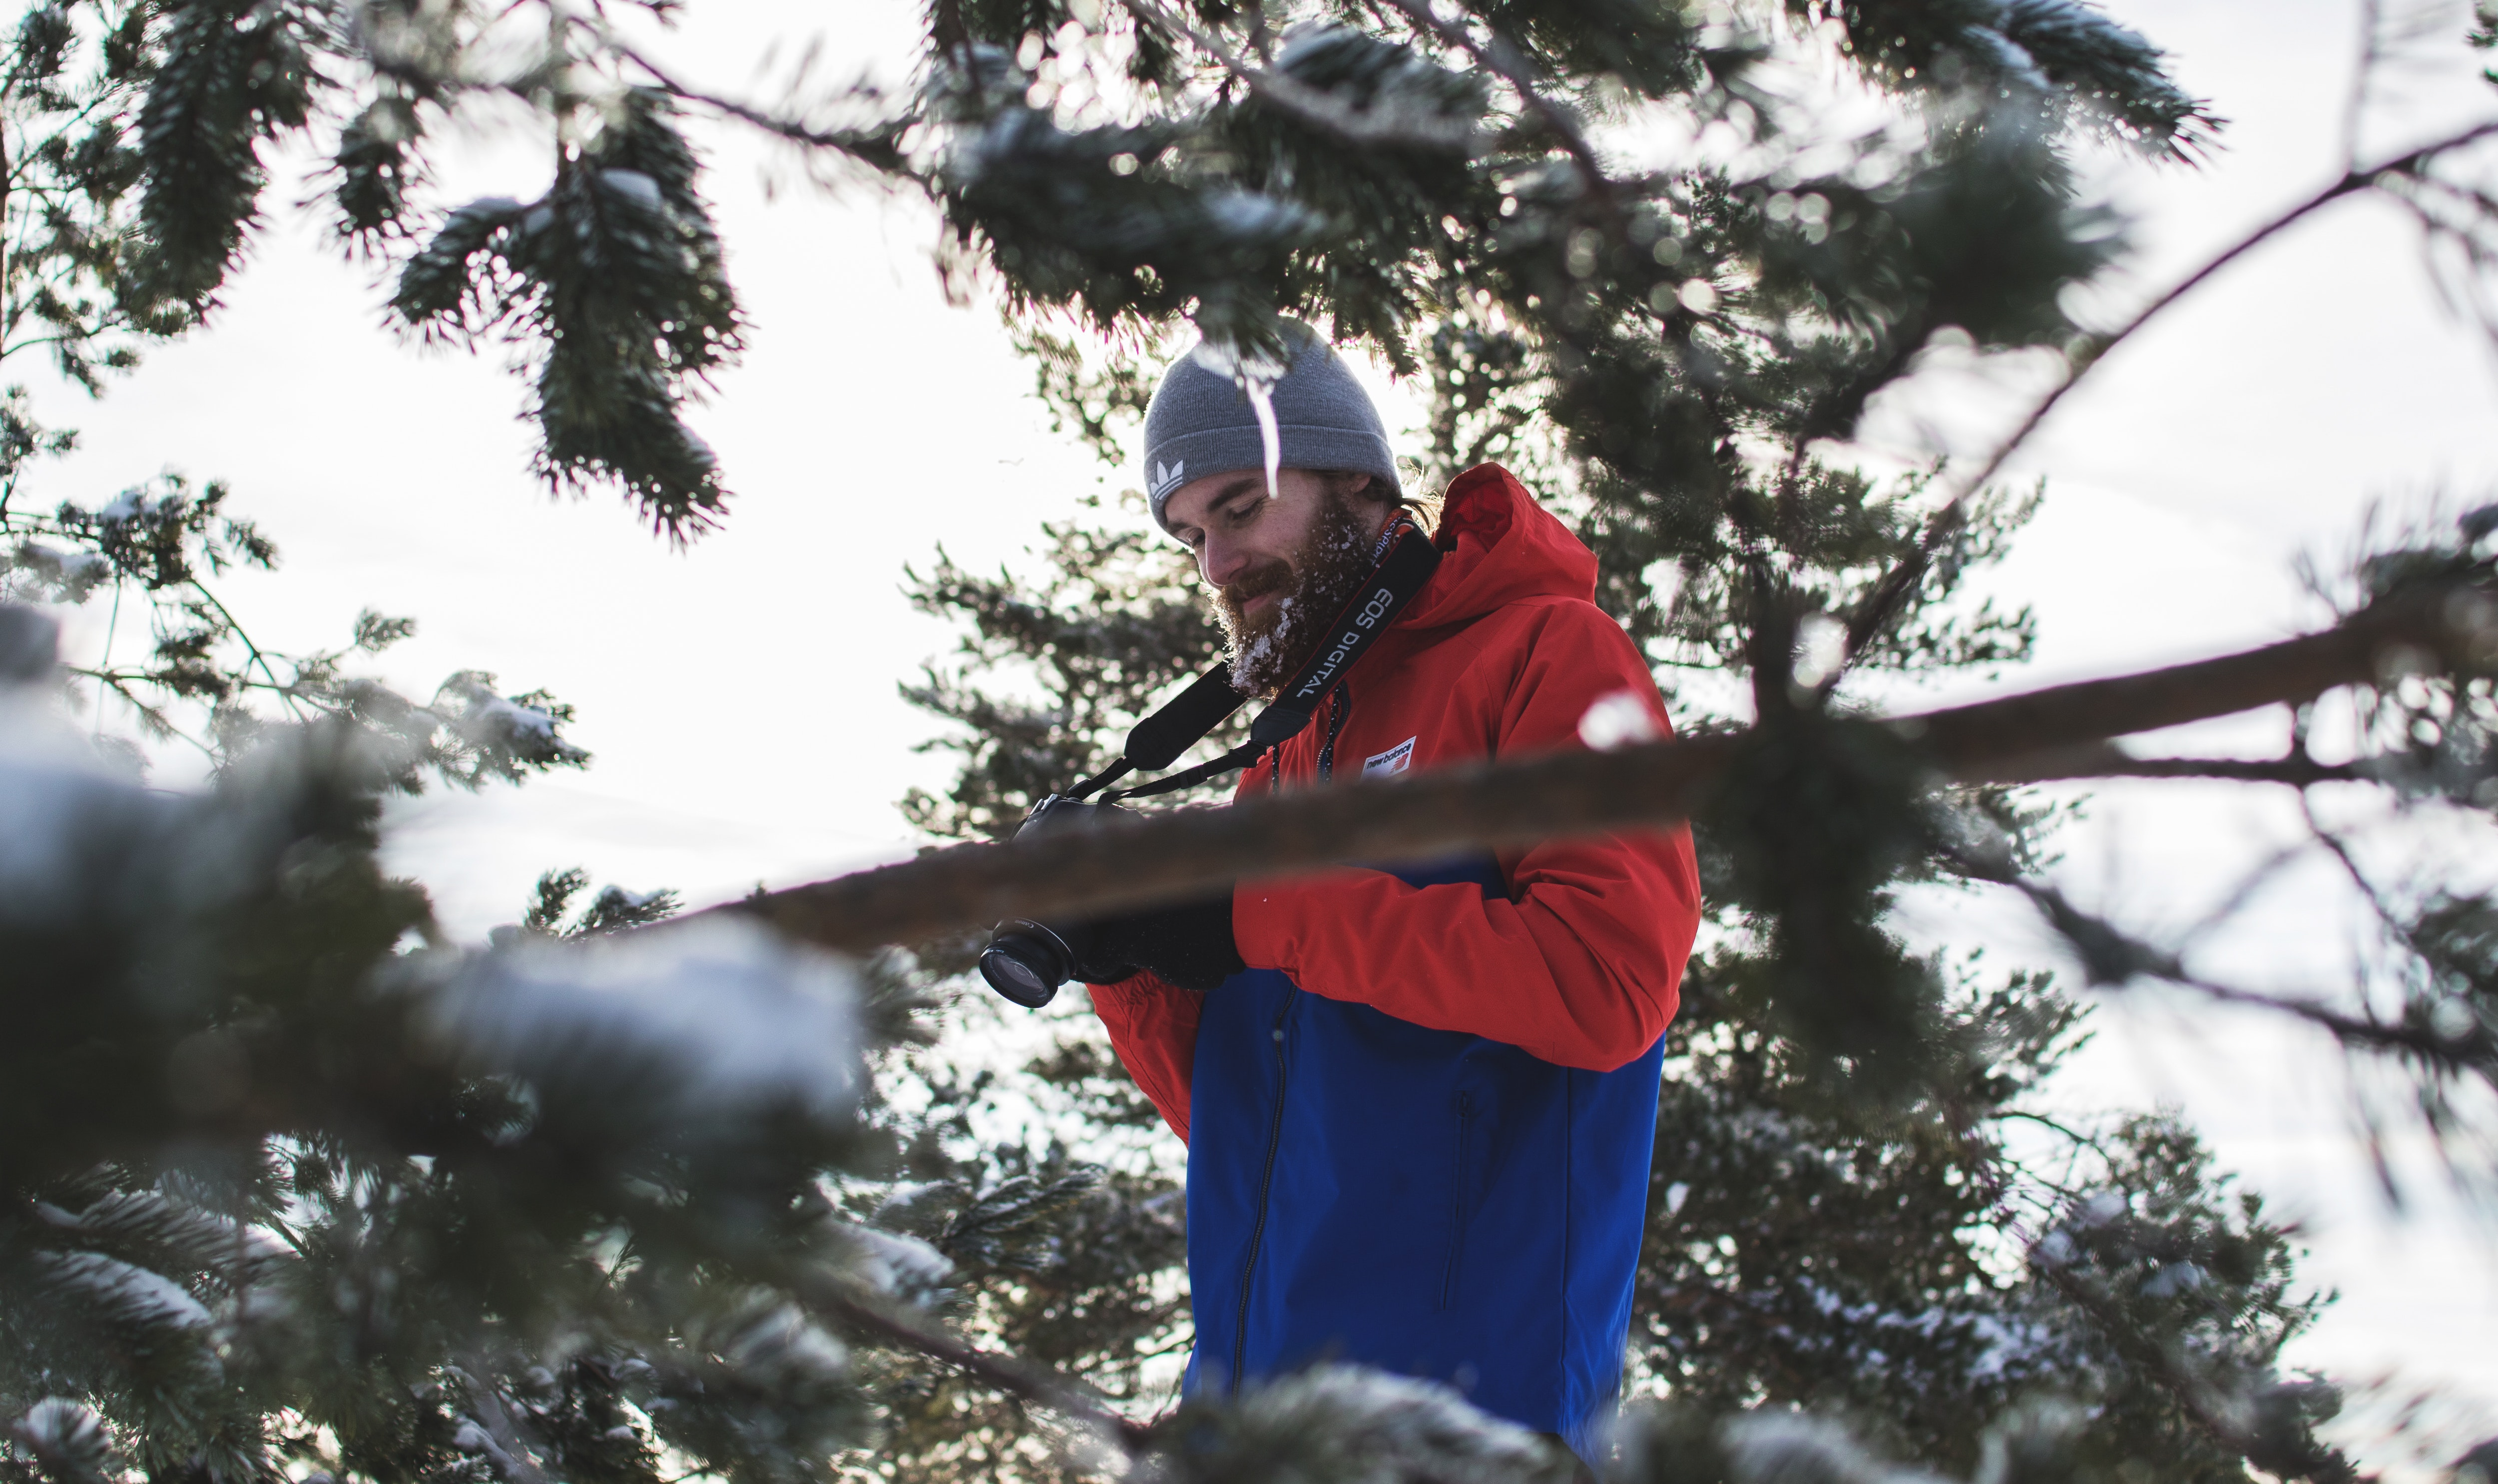 Man in Red and Blue Jacket Near Trees, Beard, Man, Winter landscape, Winter, HQ Photo